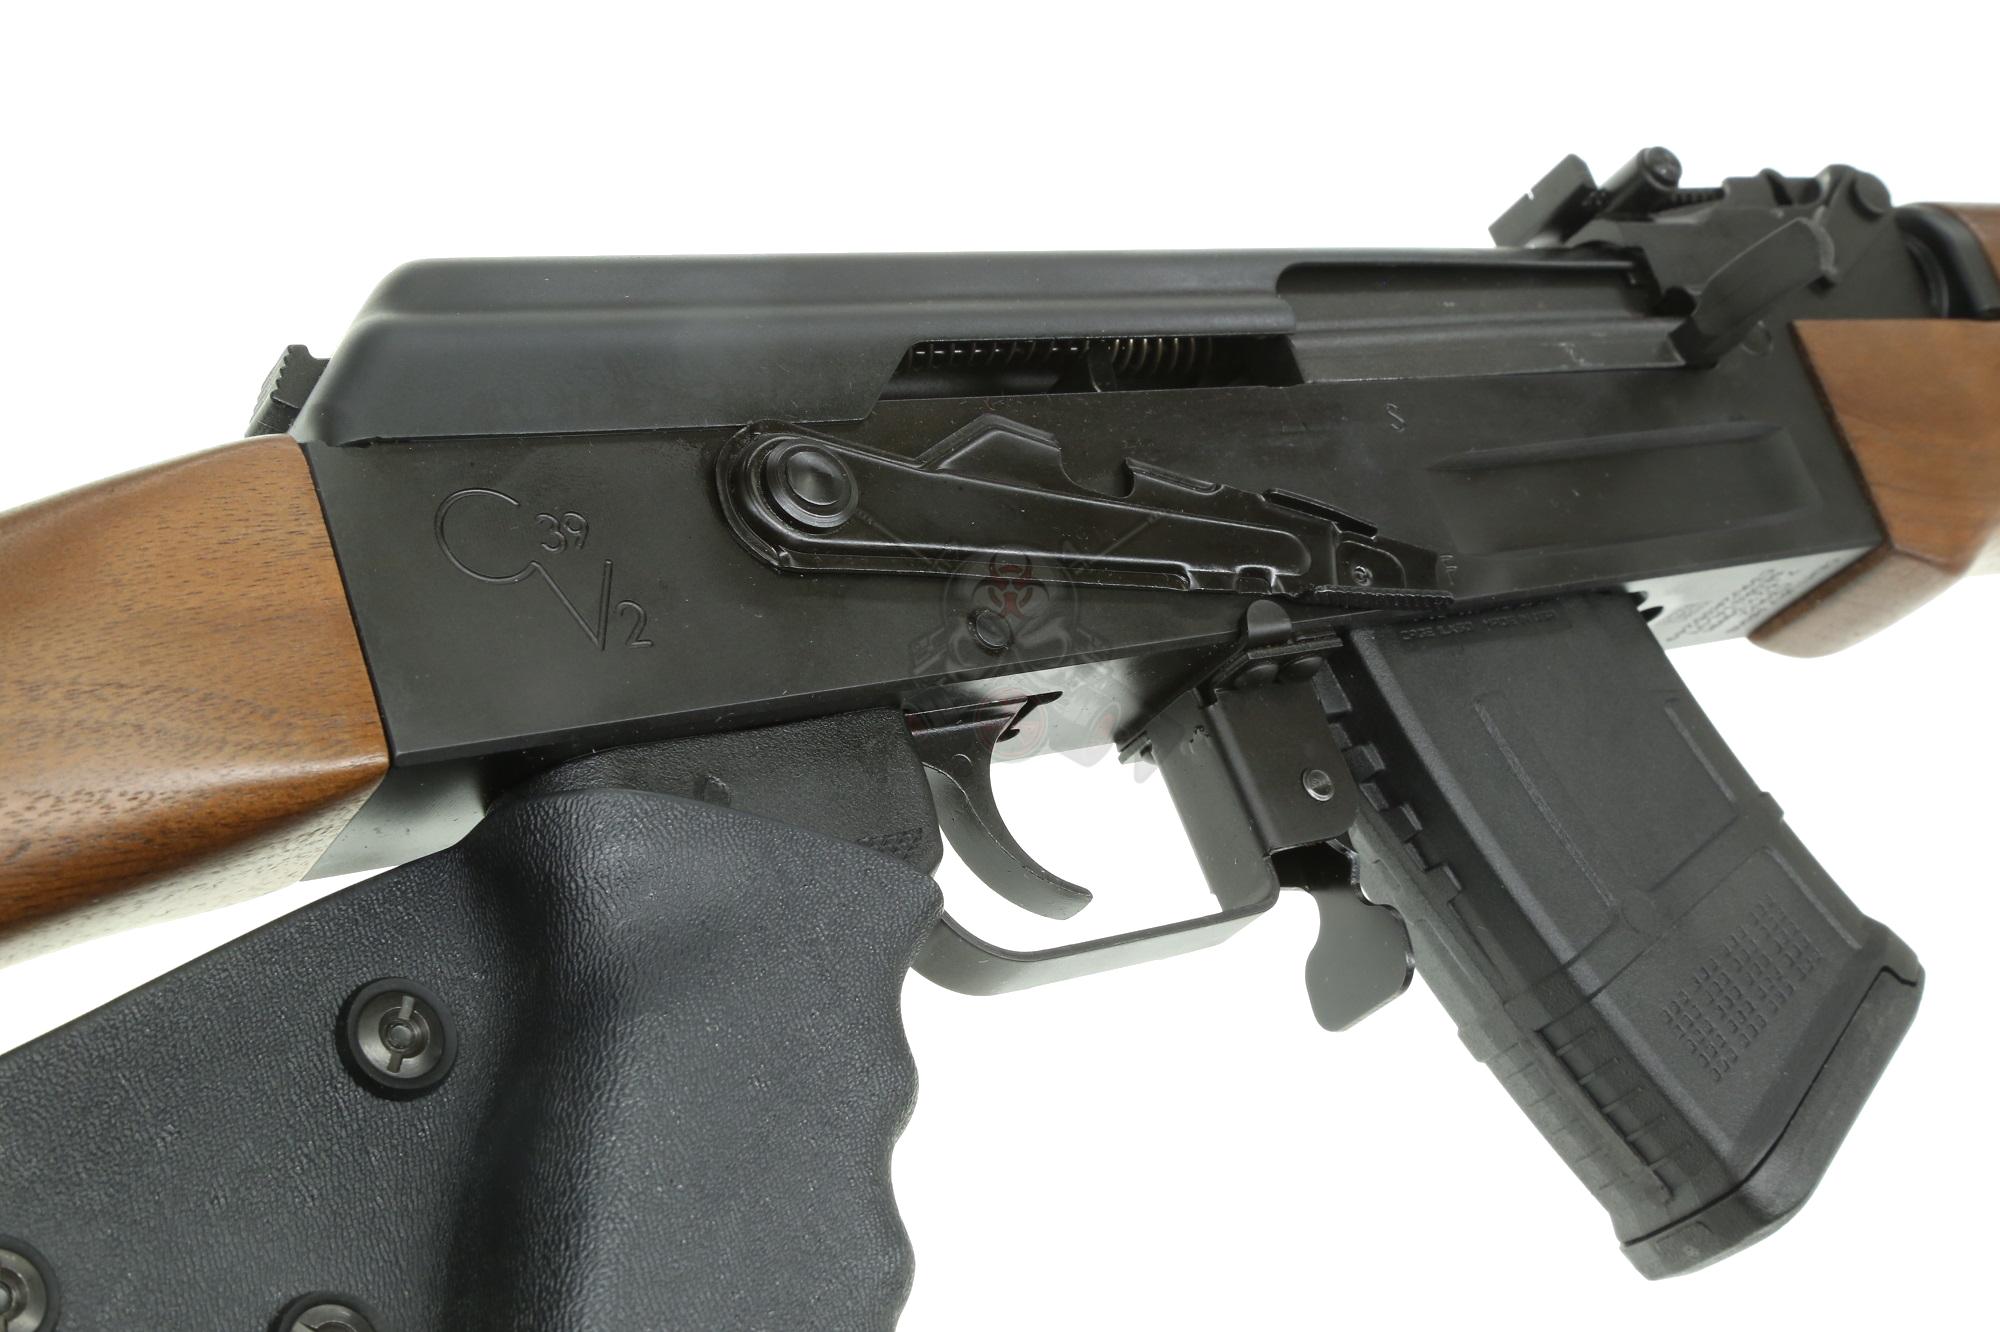 Century Arms C39V2 CA LEGAL Milled 7 62x39 AK-47 Rifle WITH SCOPE MOUNT  RAIL, Walnut furniture & installed grip wrap (1) 10rd mag RI2398CA-N